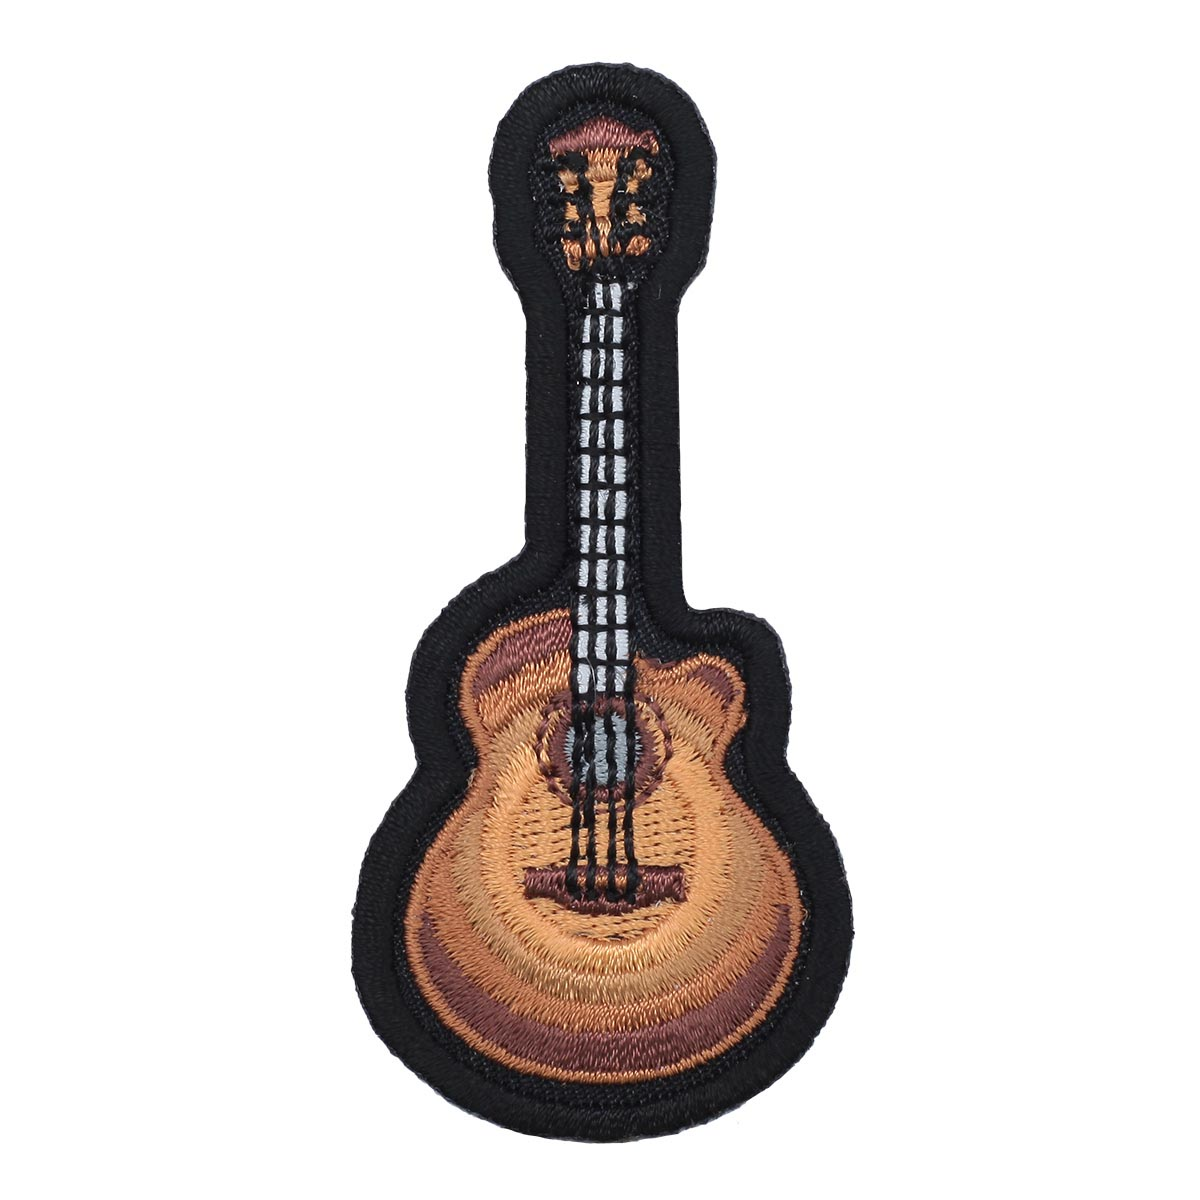 Термоаппликация 'Гитара' 3,5*7,5см Hobby&Pro